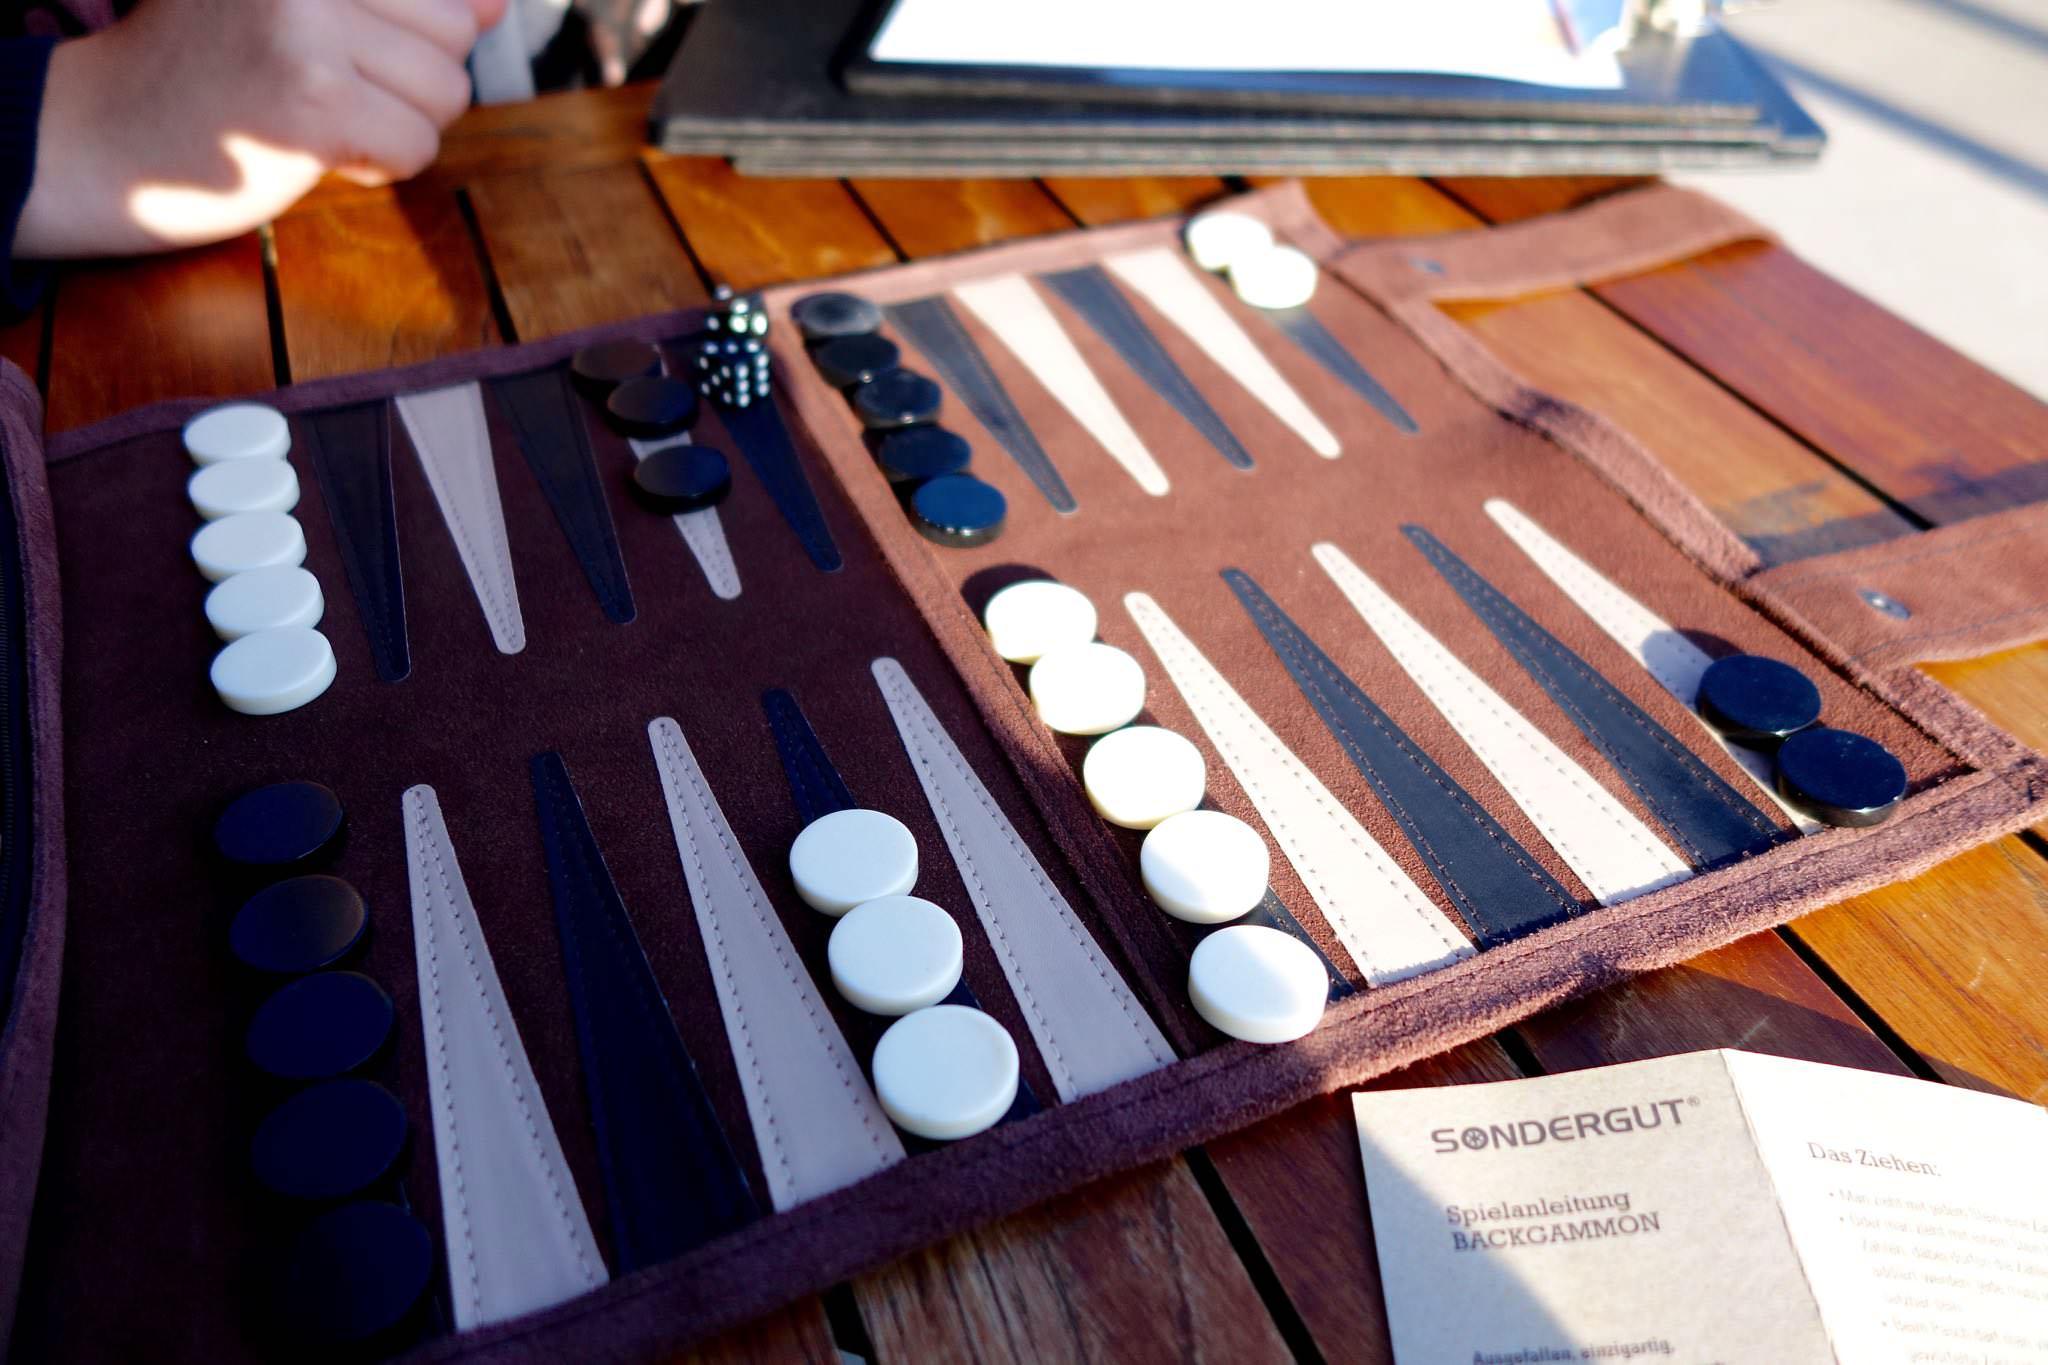 Sondergut Backgammon - 10